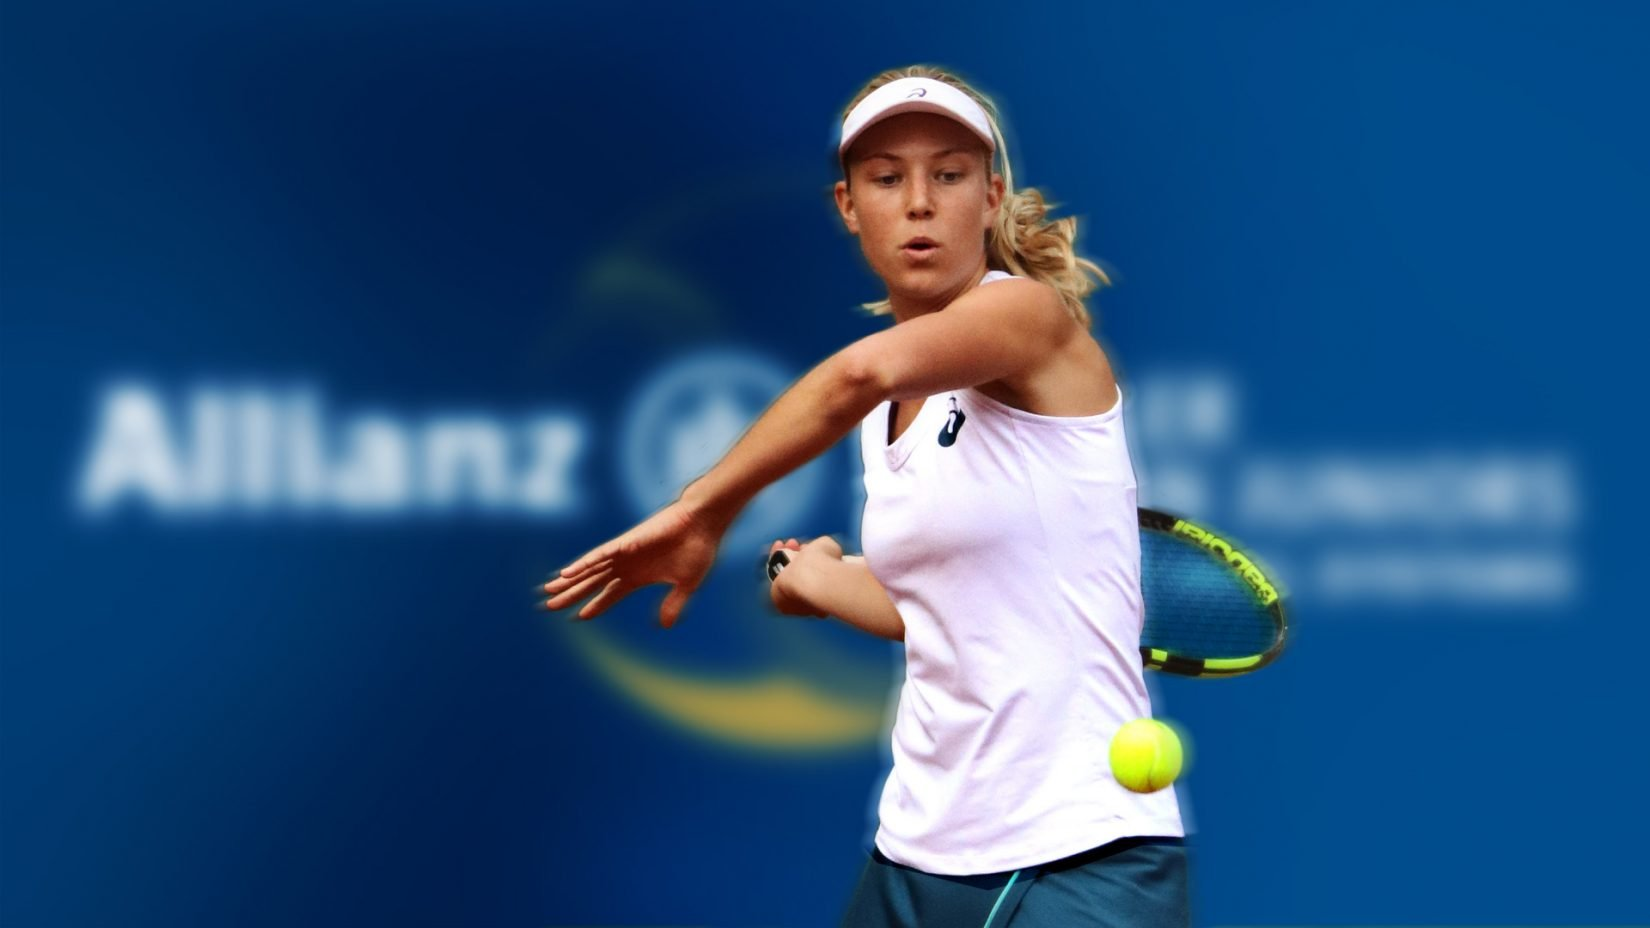 Tennisturnier Berlin - Allianz Kundler German Juniors